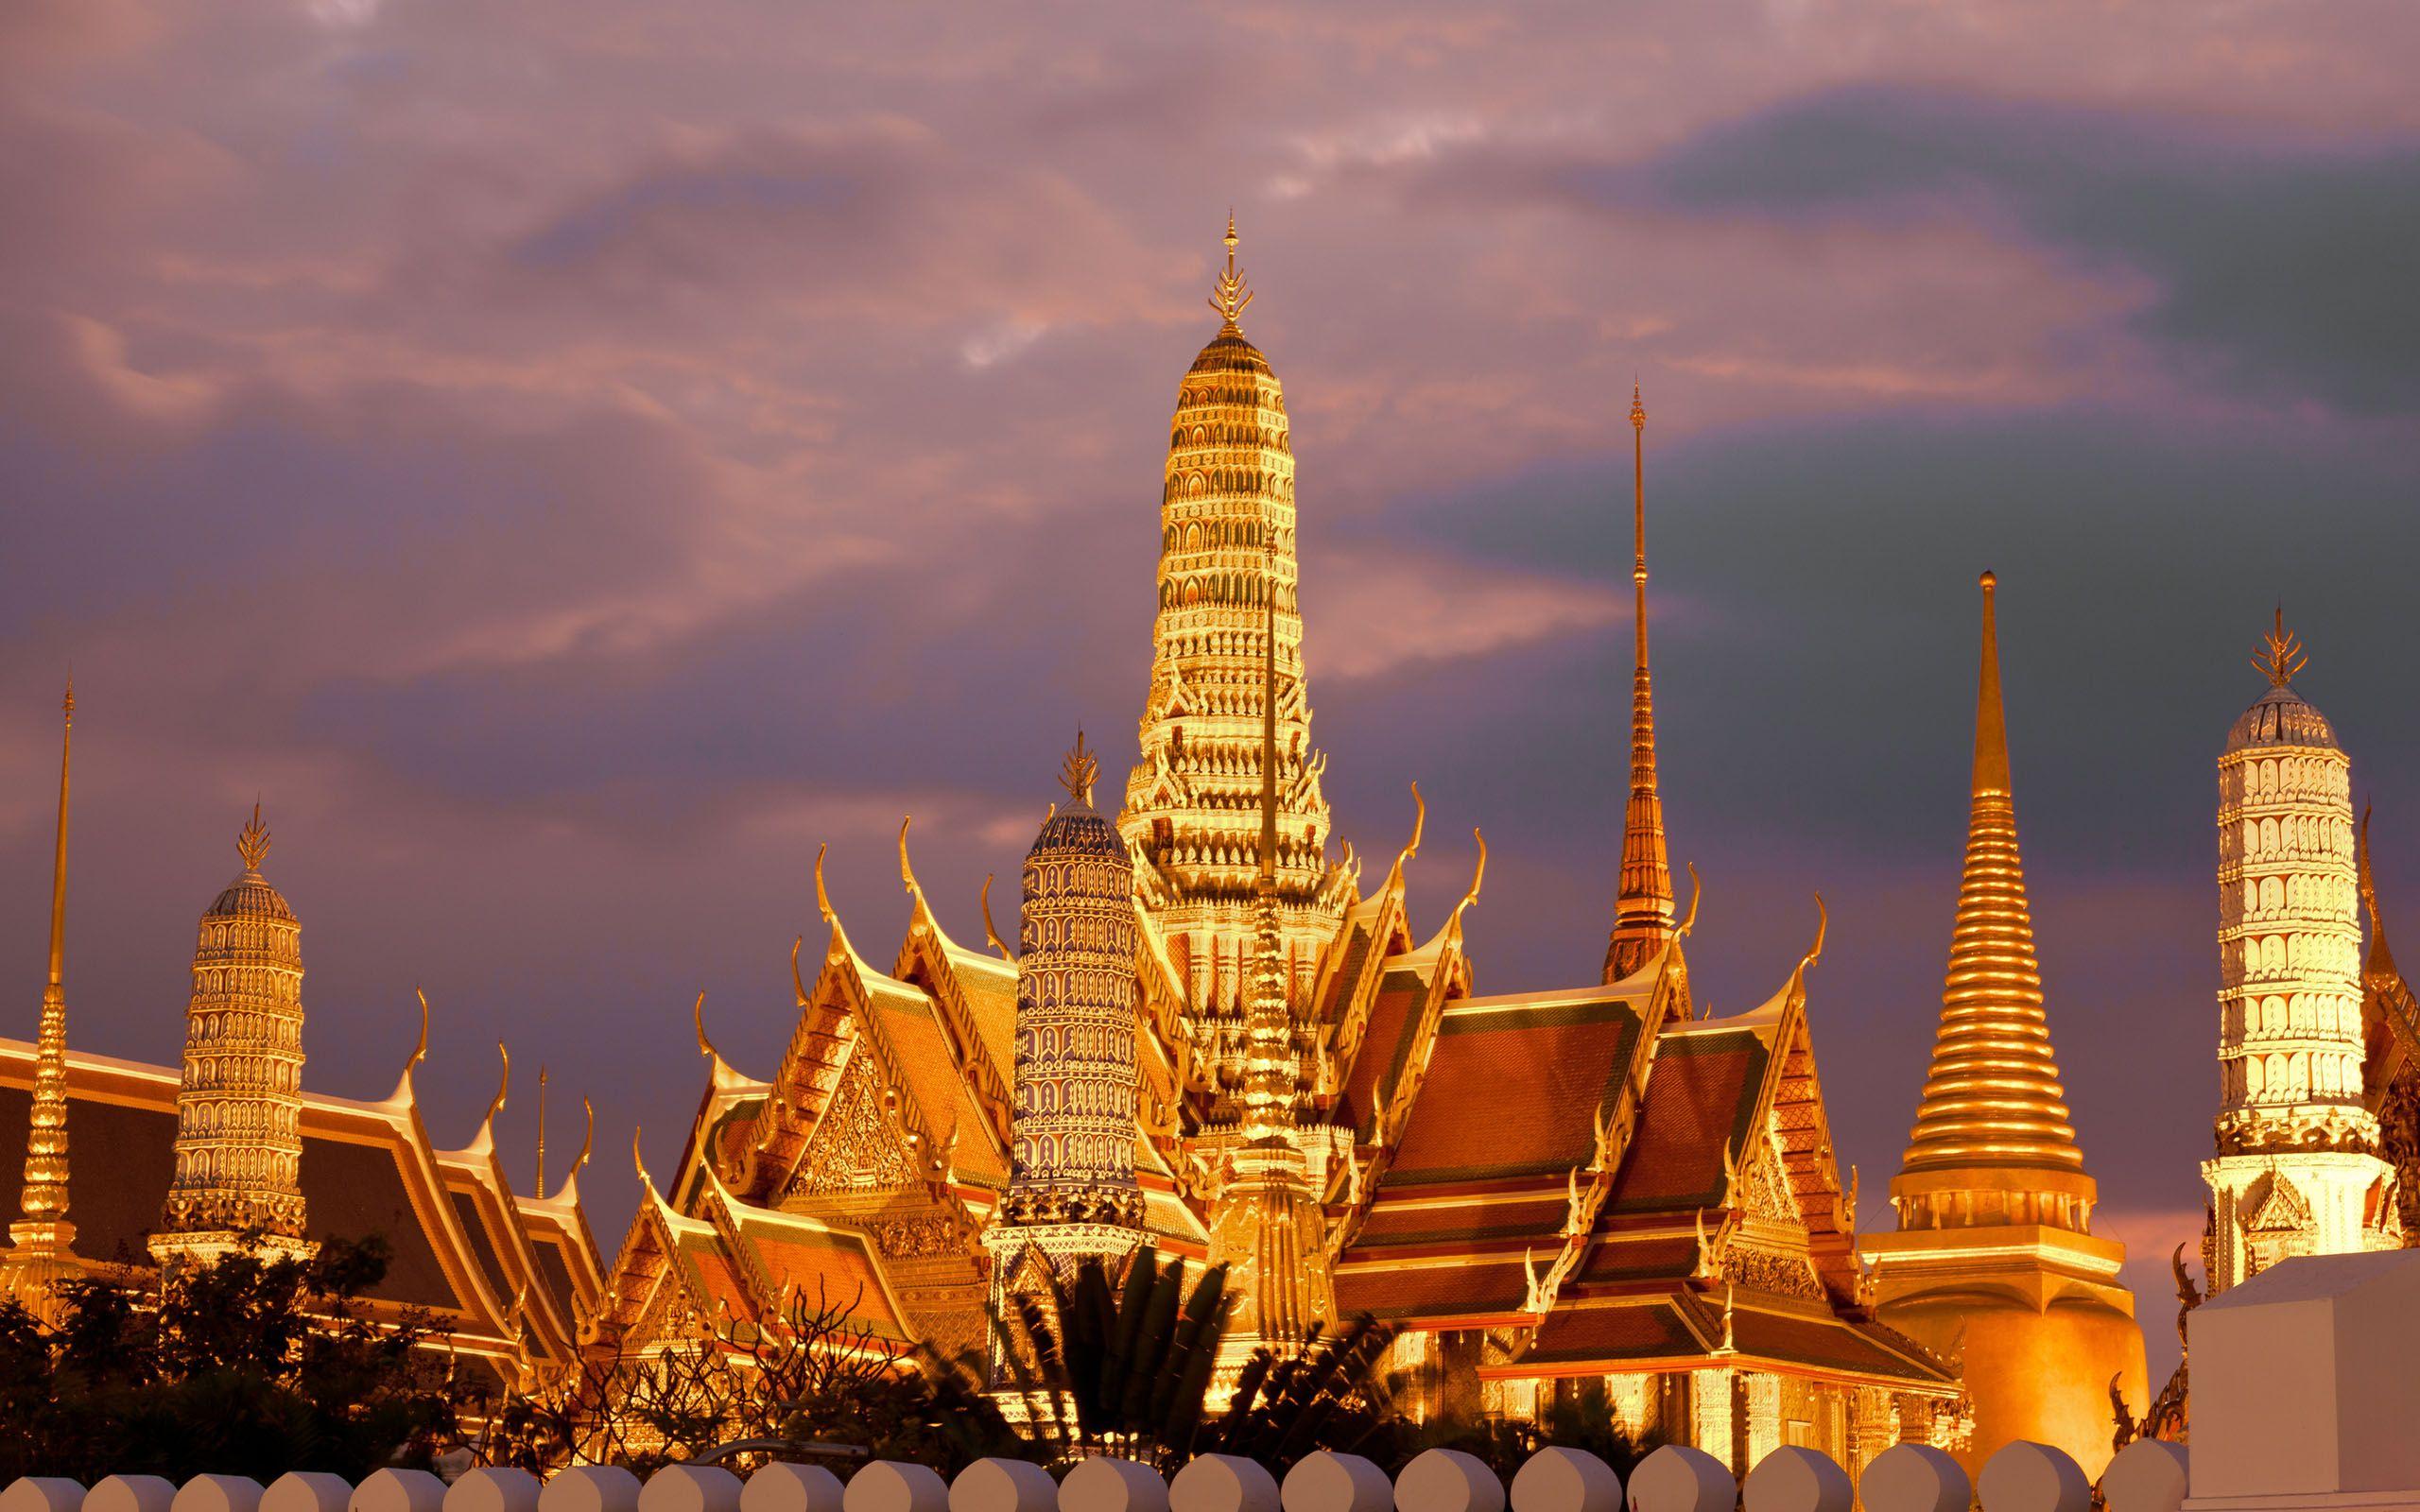 Kết quả hình ảnh cho golden temple thailand